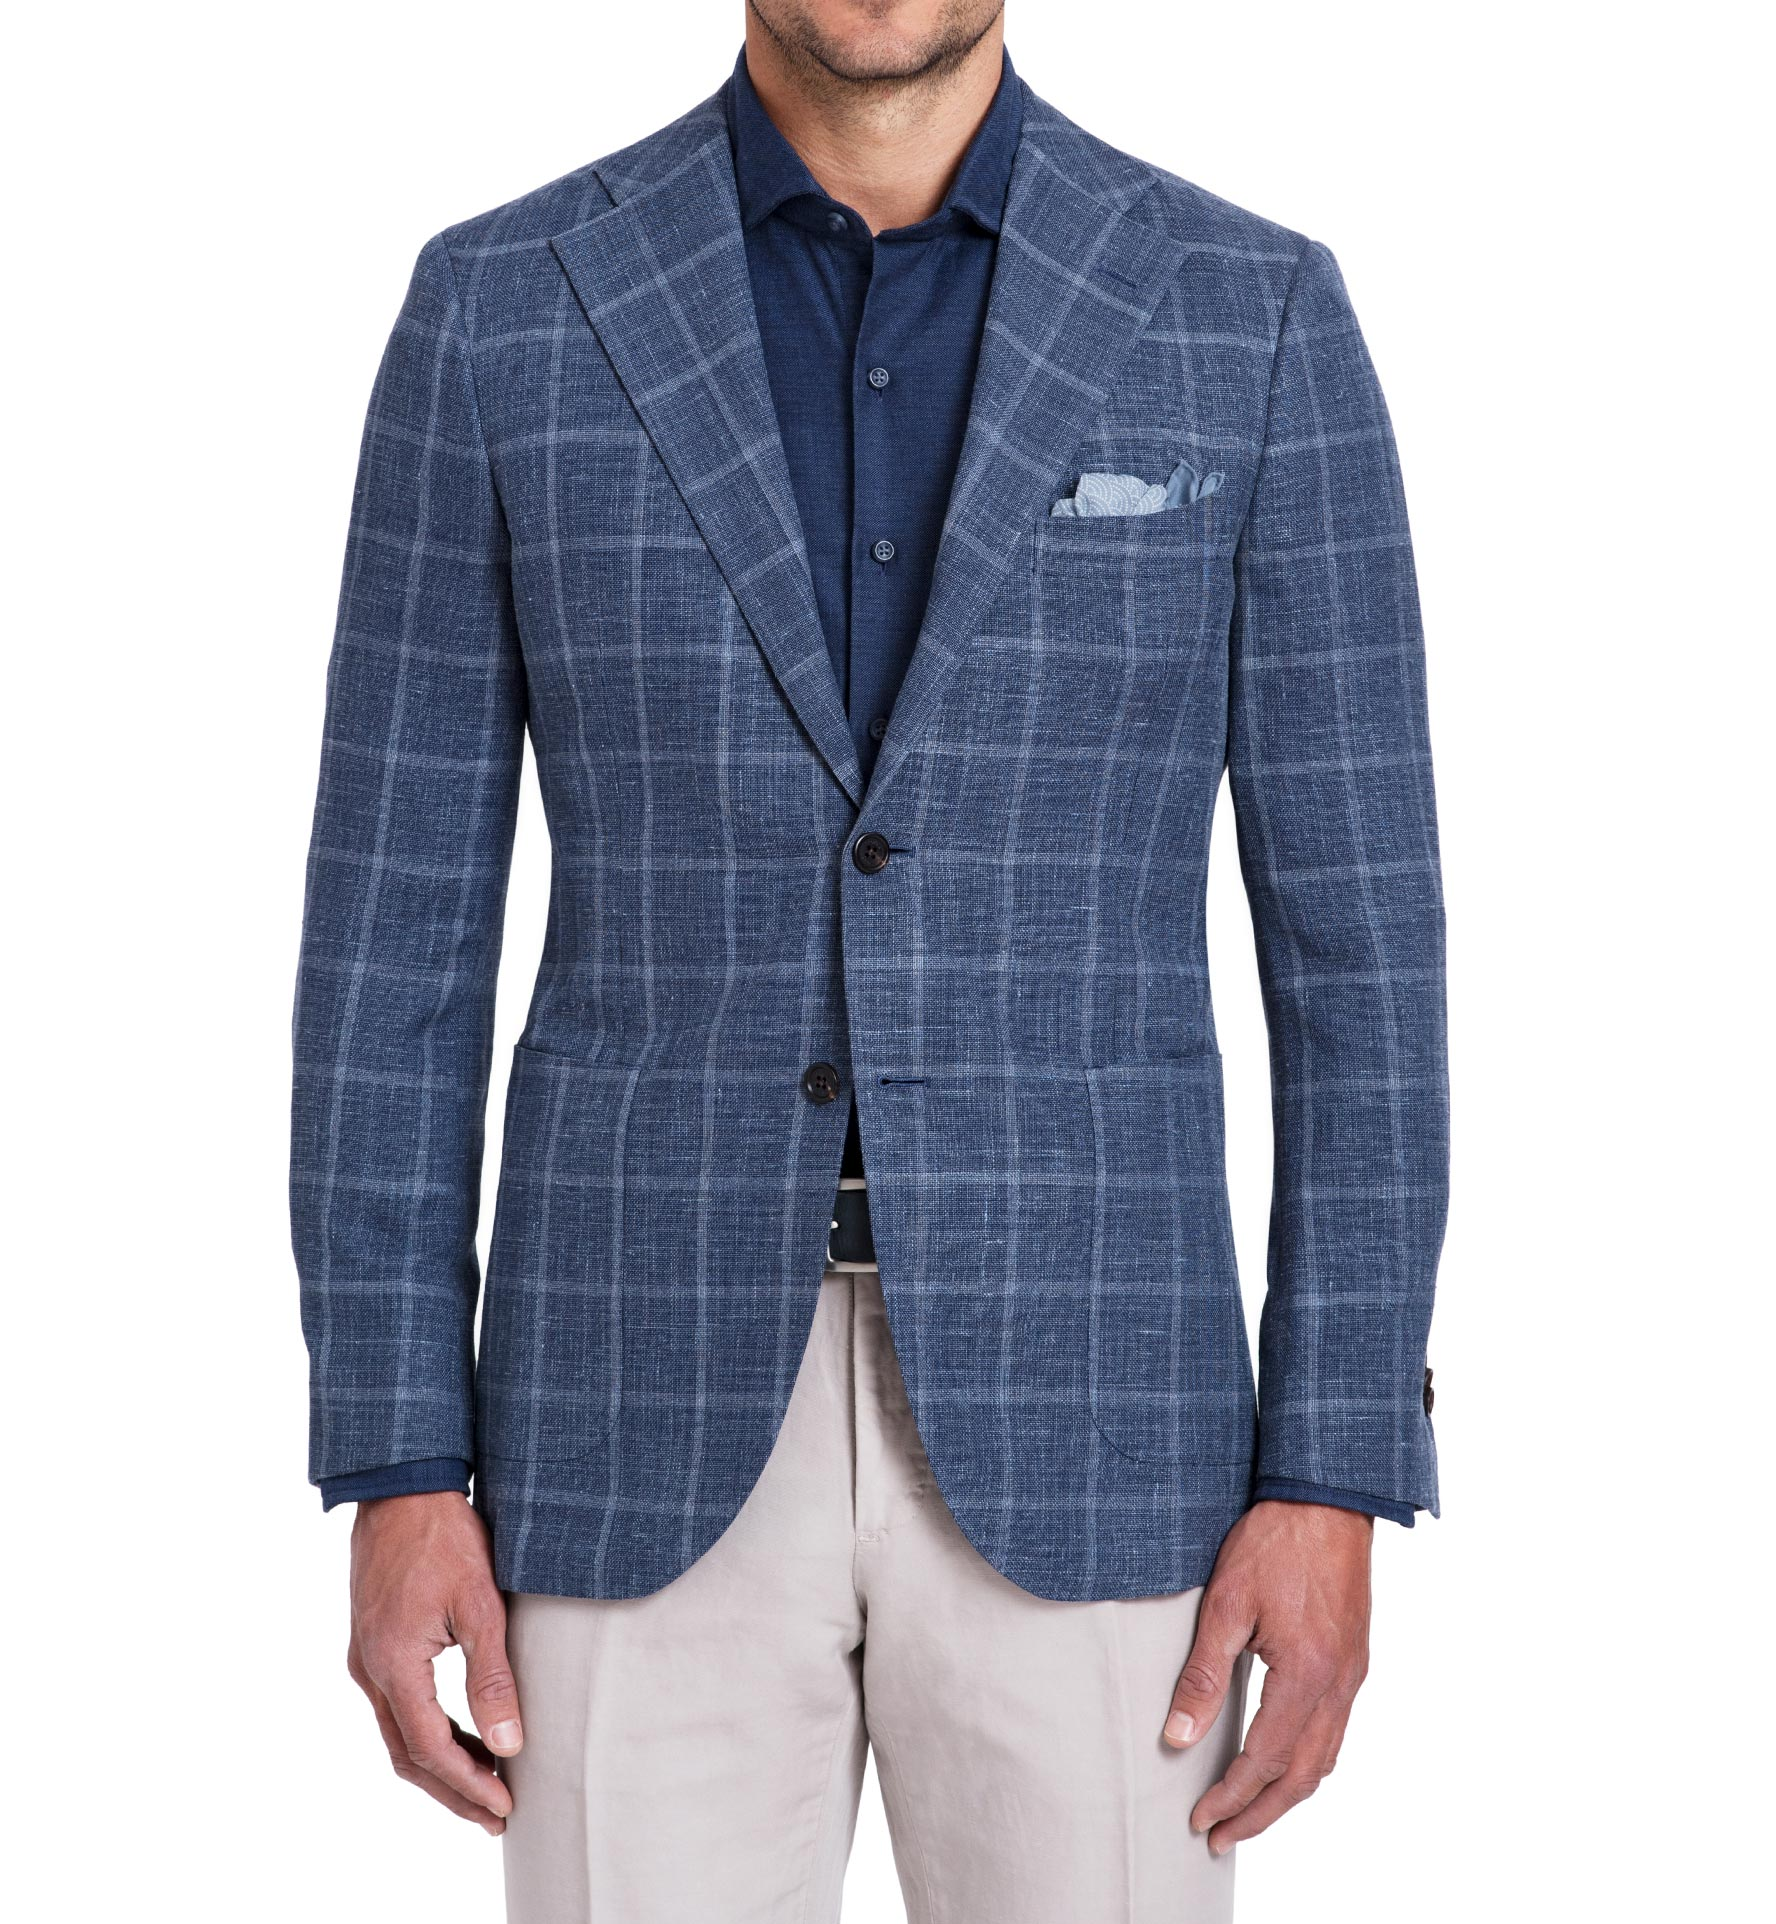 Zoom Image of Bedford Slate Blue Windowpane Jacket